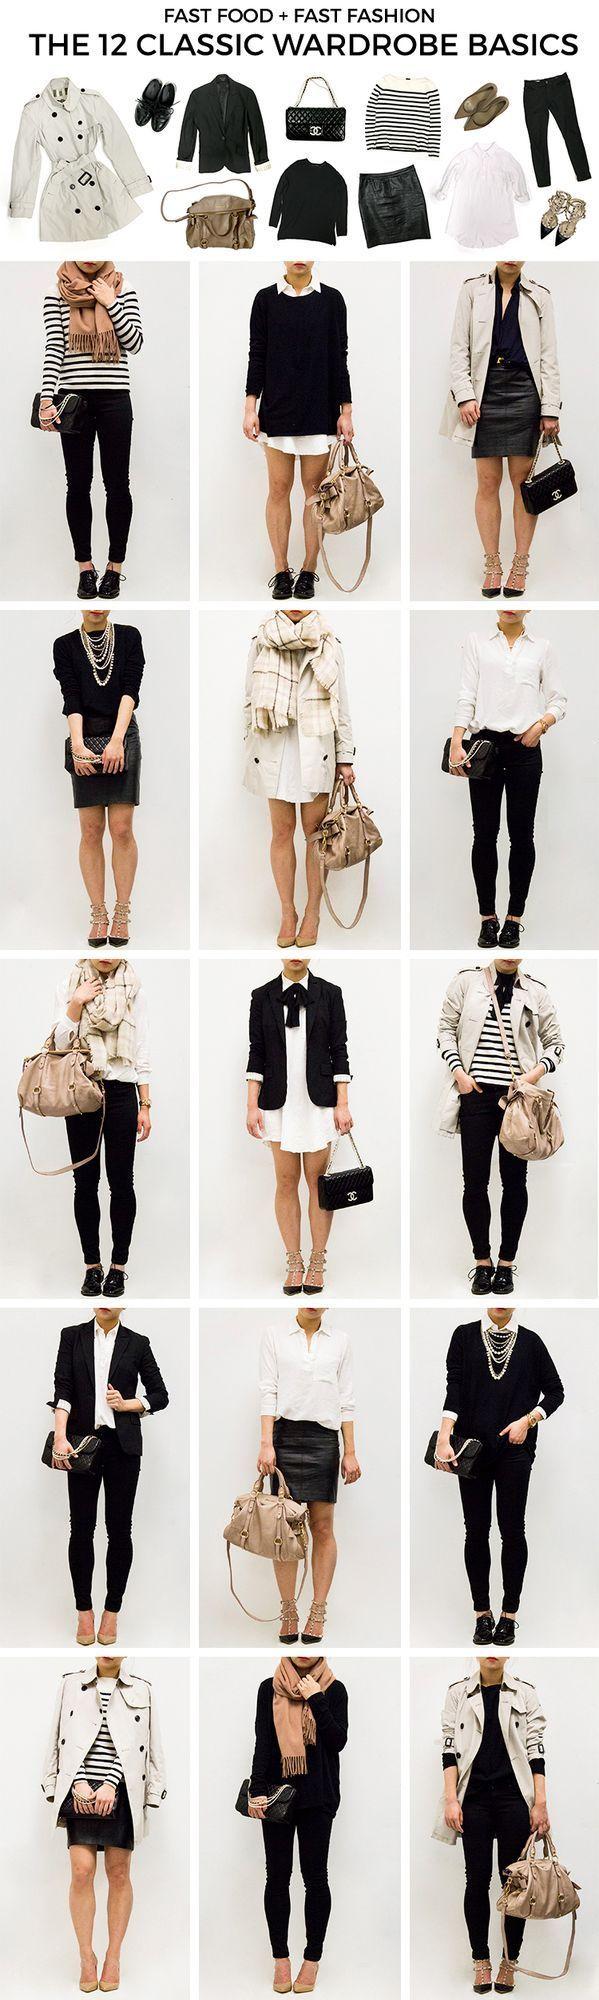 cool The Ultimate Capsule Wardrobe: Basics (Fast Food & Fast Fashion)